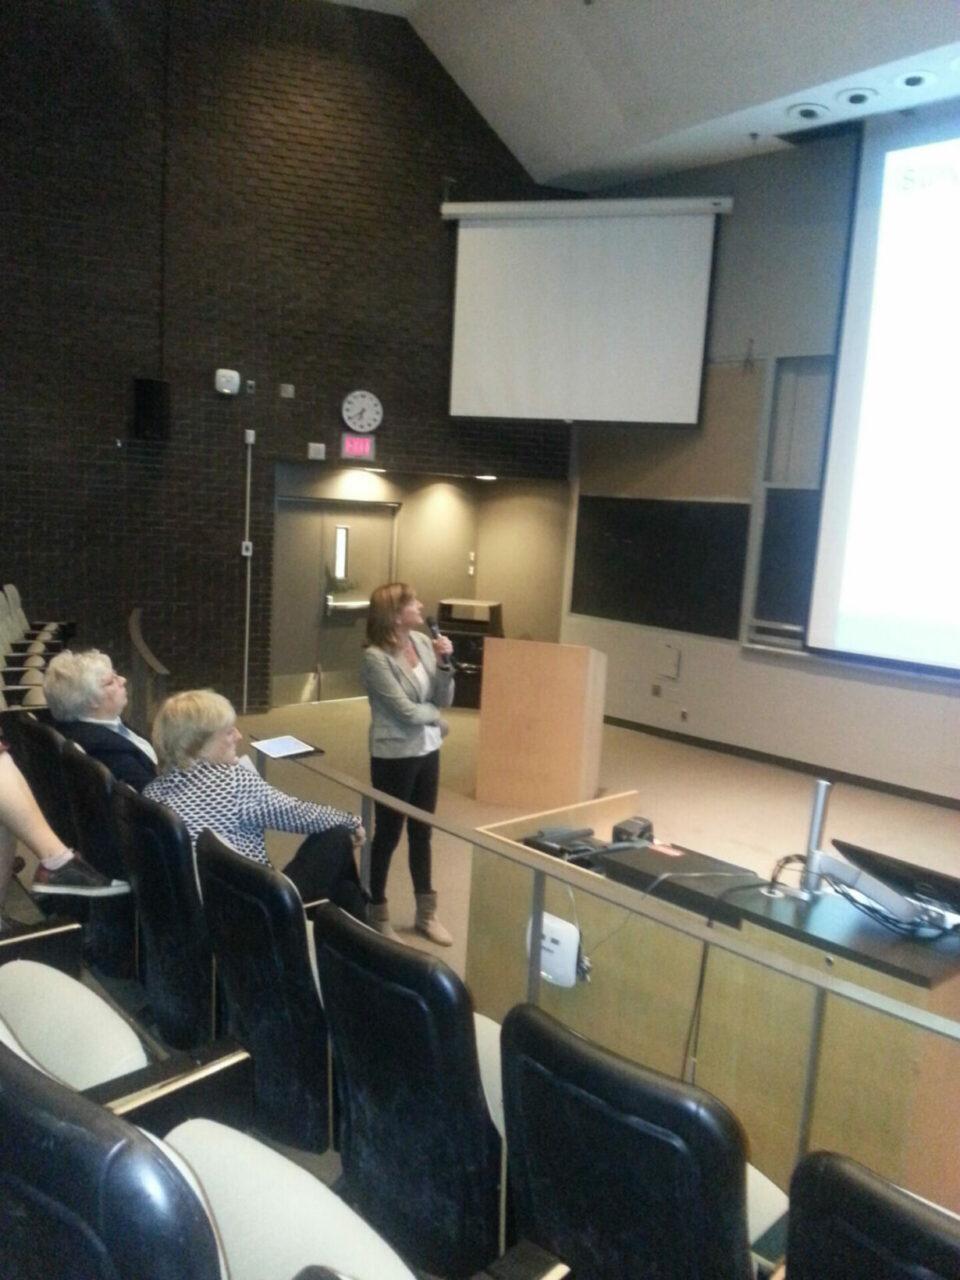 McGill survivorship expert, nurse-scientist Carmen Loiselle (Ingram School of Nursing). Photo: Annette Novak.